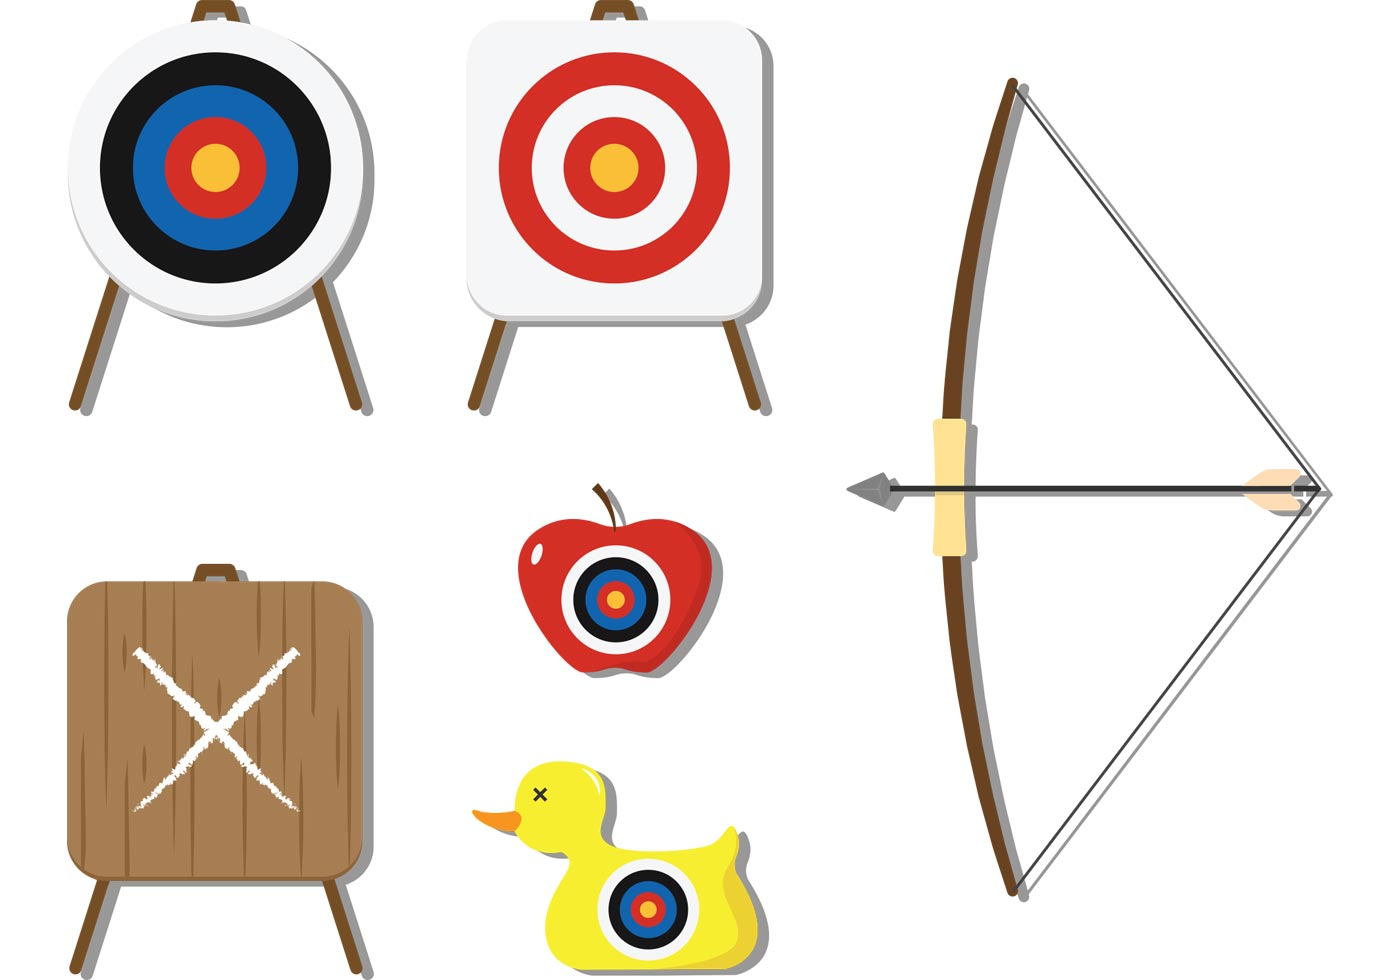 Archery and Target Vectors - Download Free Vectors ...